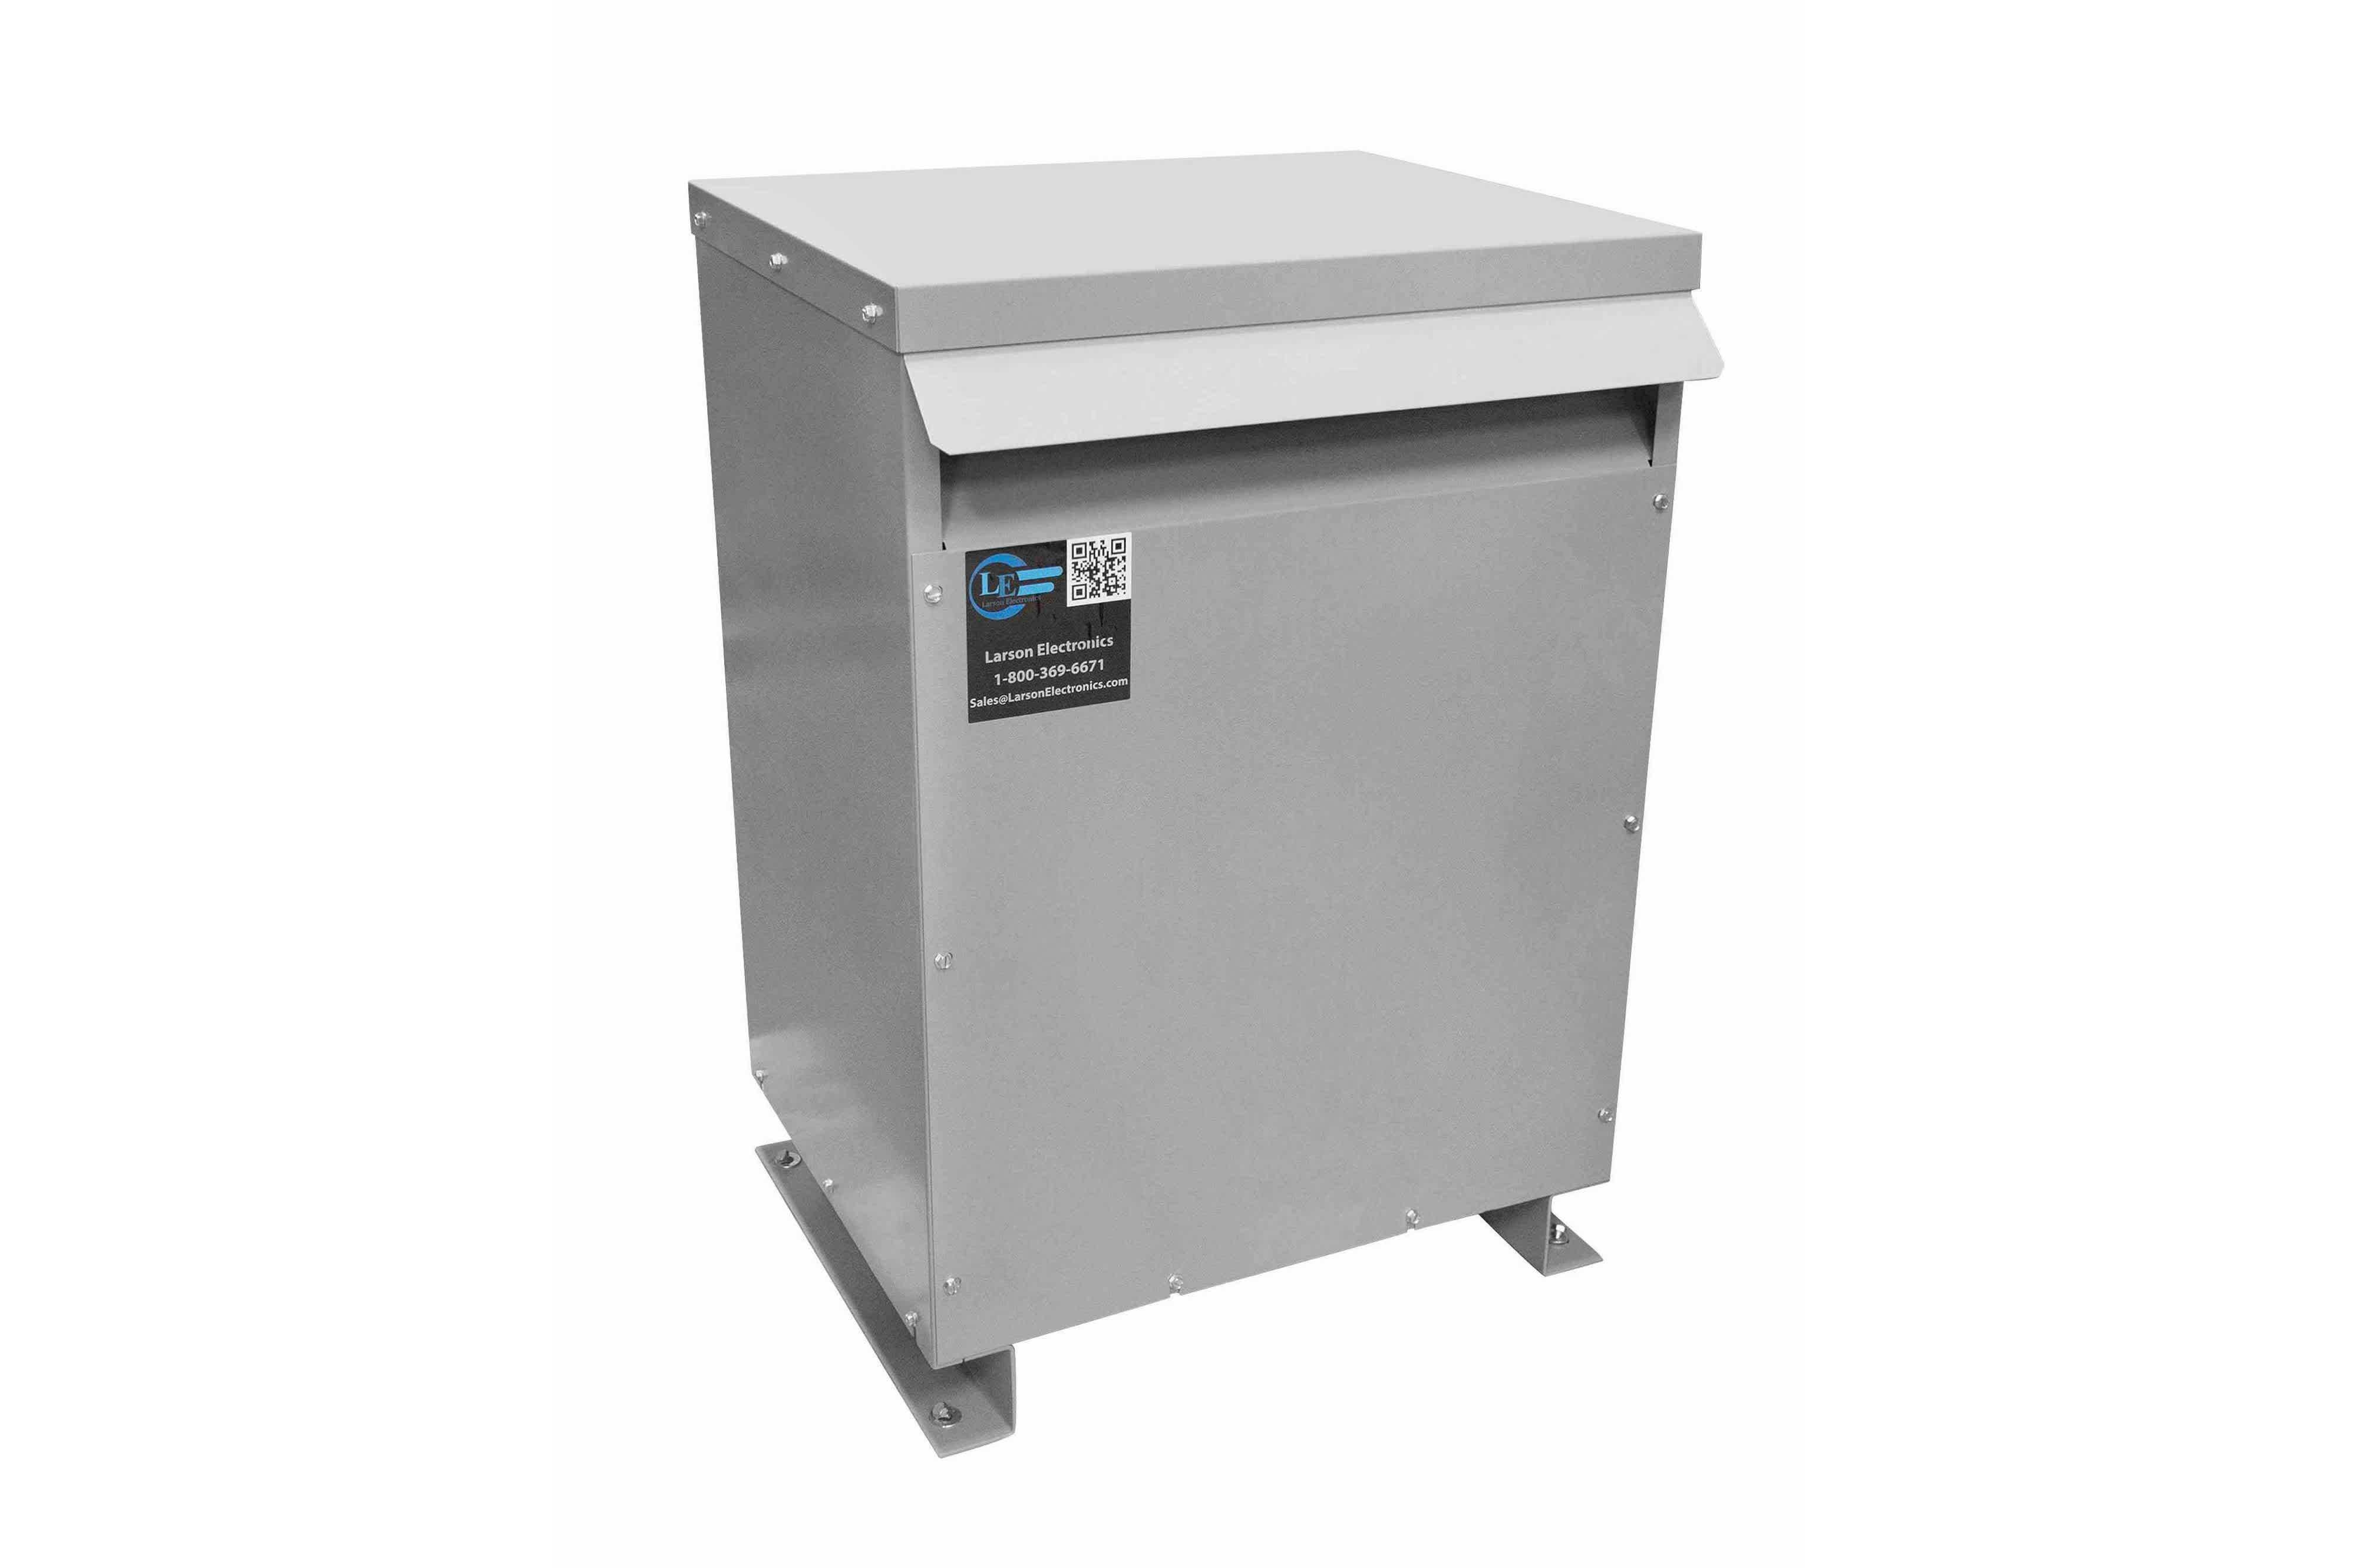 300 kVA 3PH Isolation Transformer, 230V Wye Primary, 208Y/120 Wye-N Secondary, N3R, Ventilated, 60 Hz